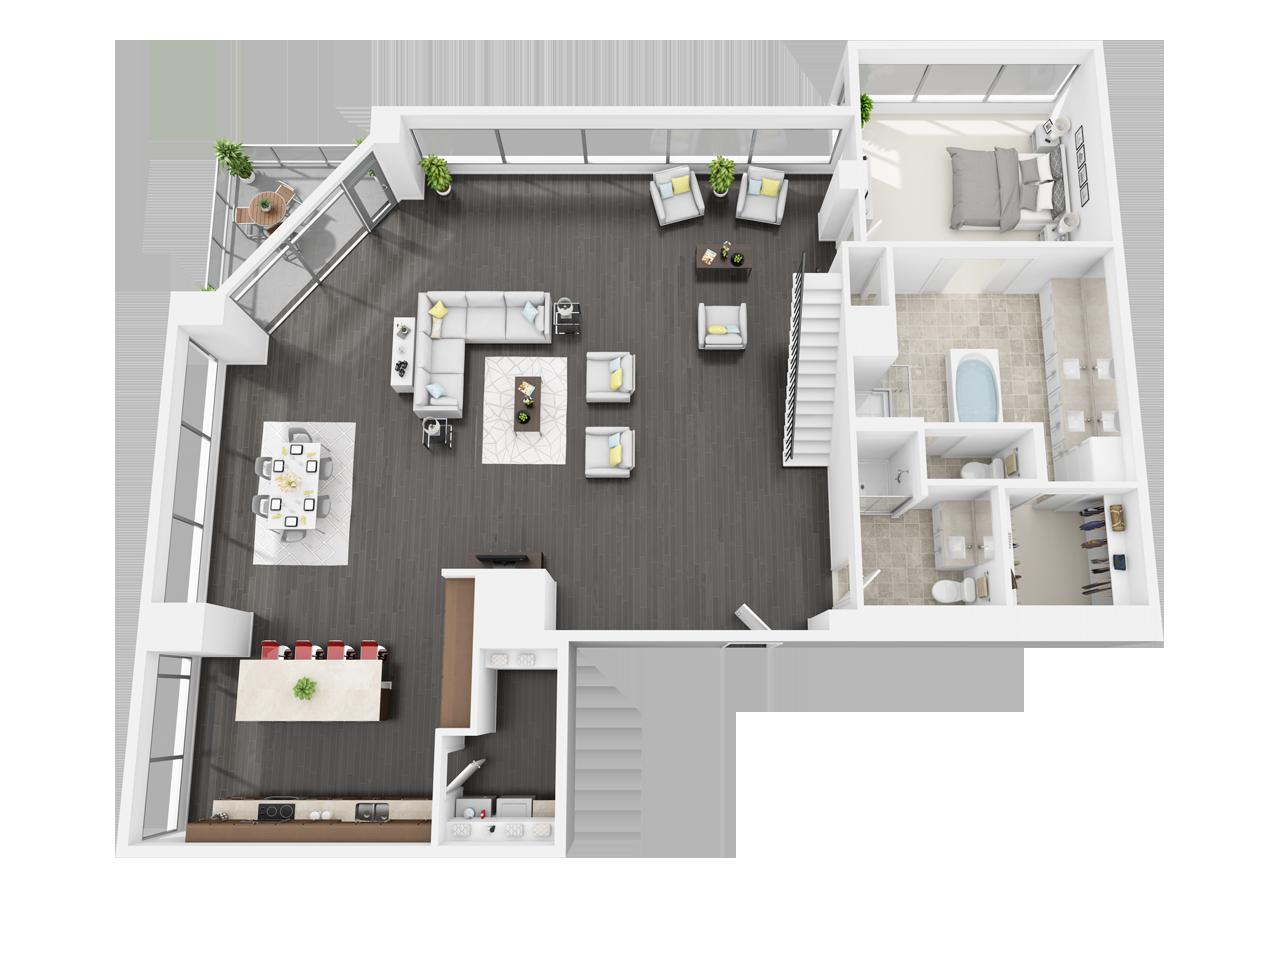 1 2 3 Bedroom Downtown Los Angeles Ca Apartments Diseno Casas Pequenas Planos Para Construir Casas Casas Modernas Interiores